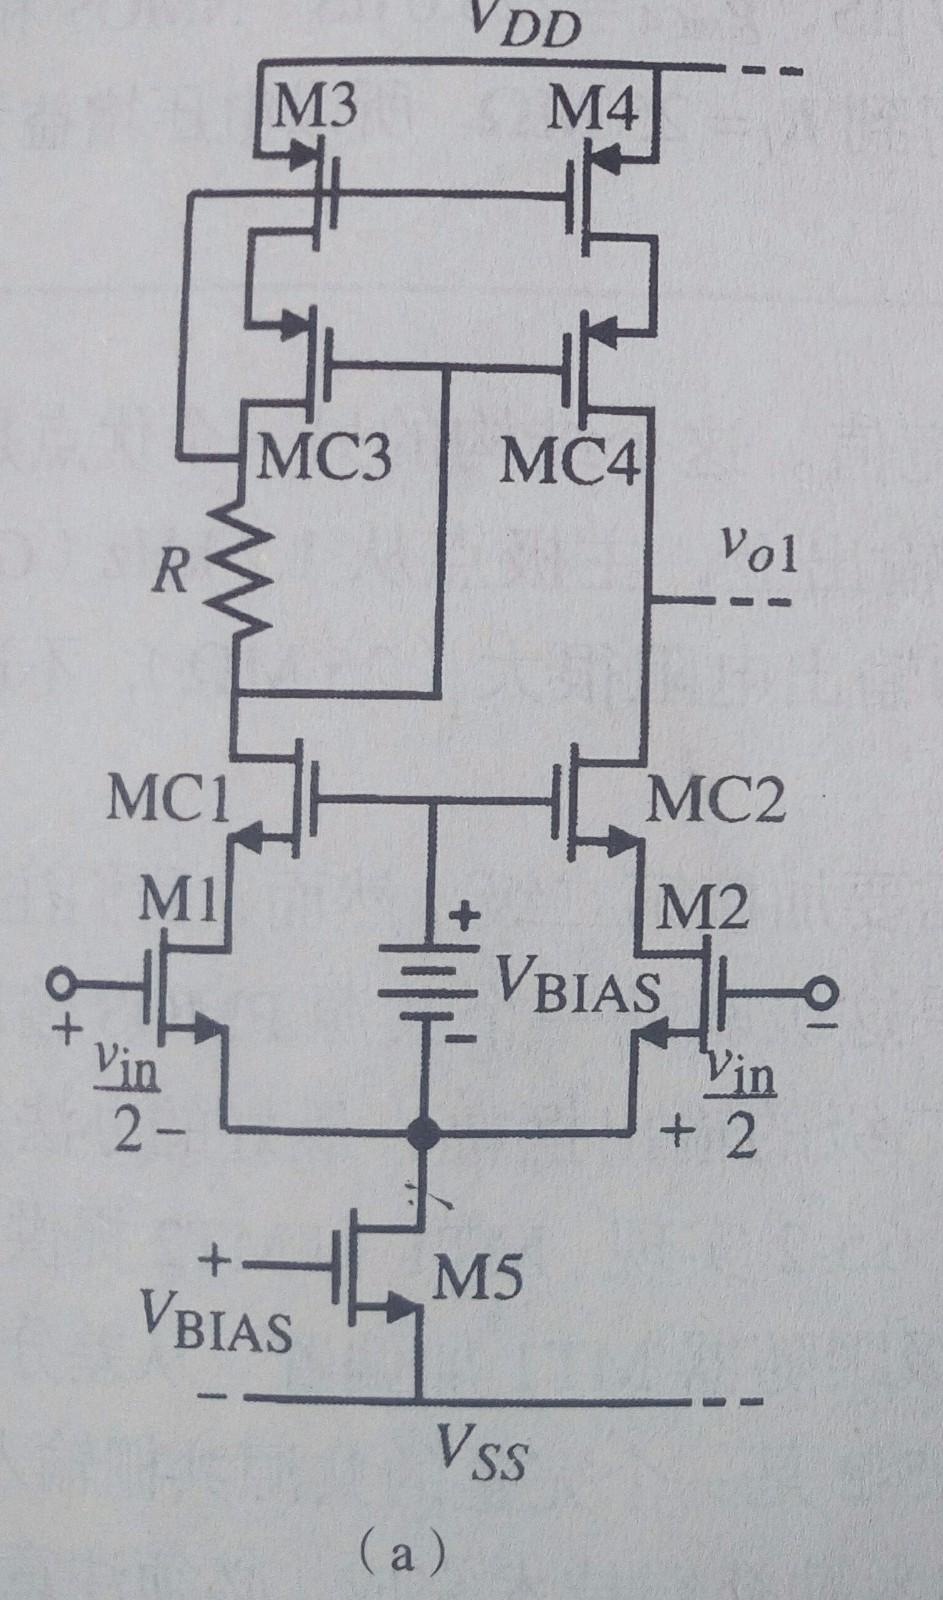 pmos与nmos的辨别 该电路图中的场效应管都是pmos吗?有nmos吗?哪些是?